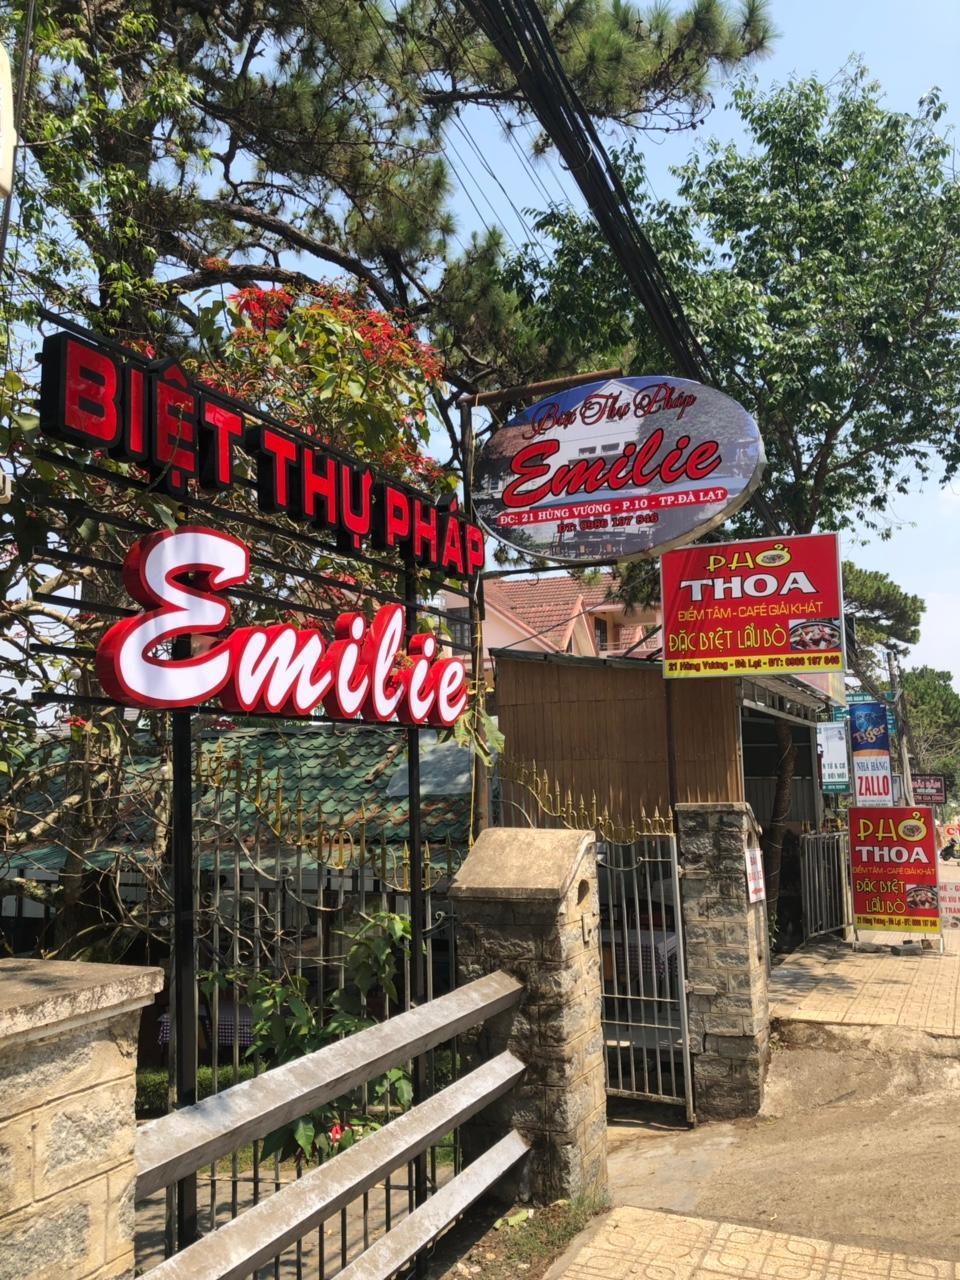 Biet Thu Phap Emilie Room 202